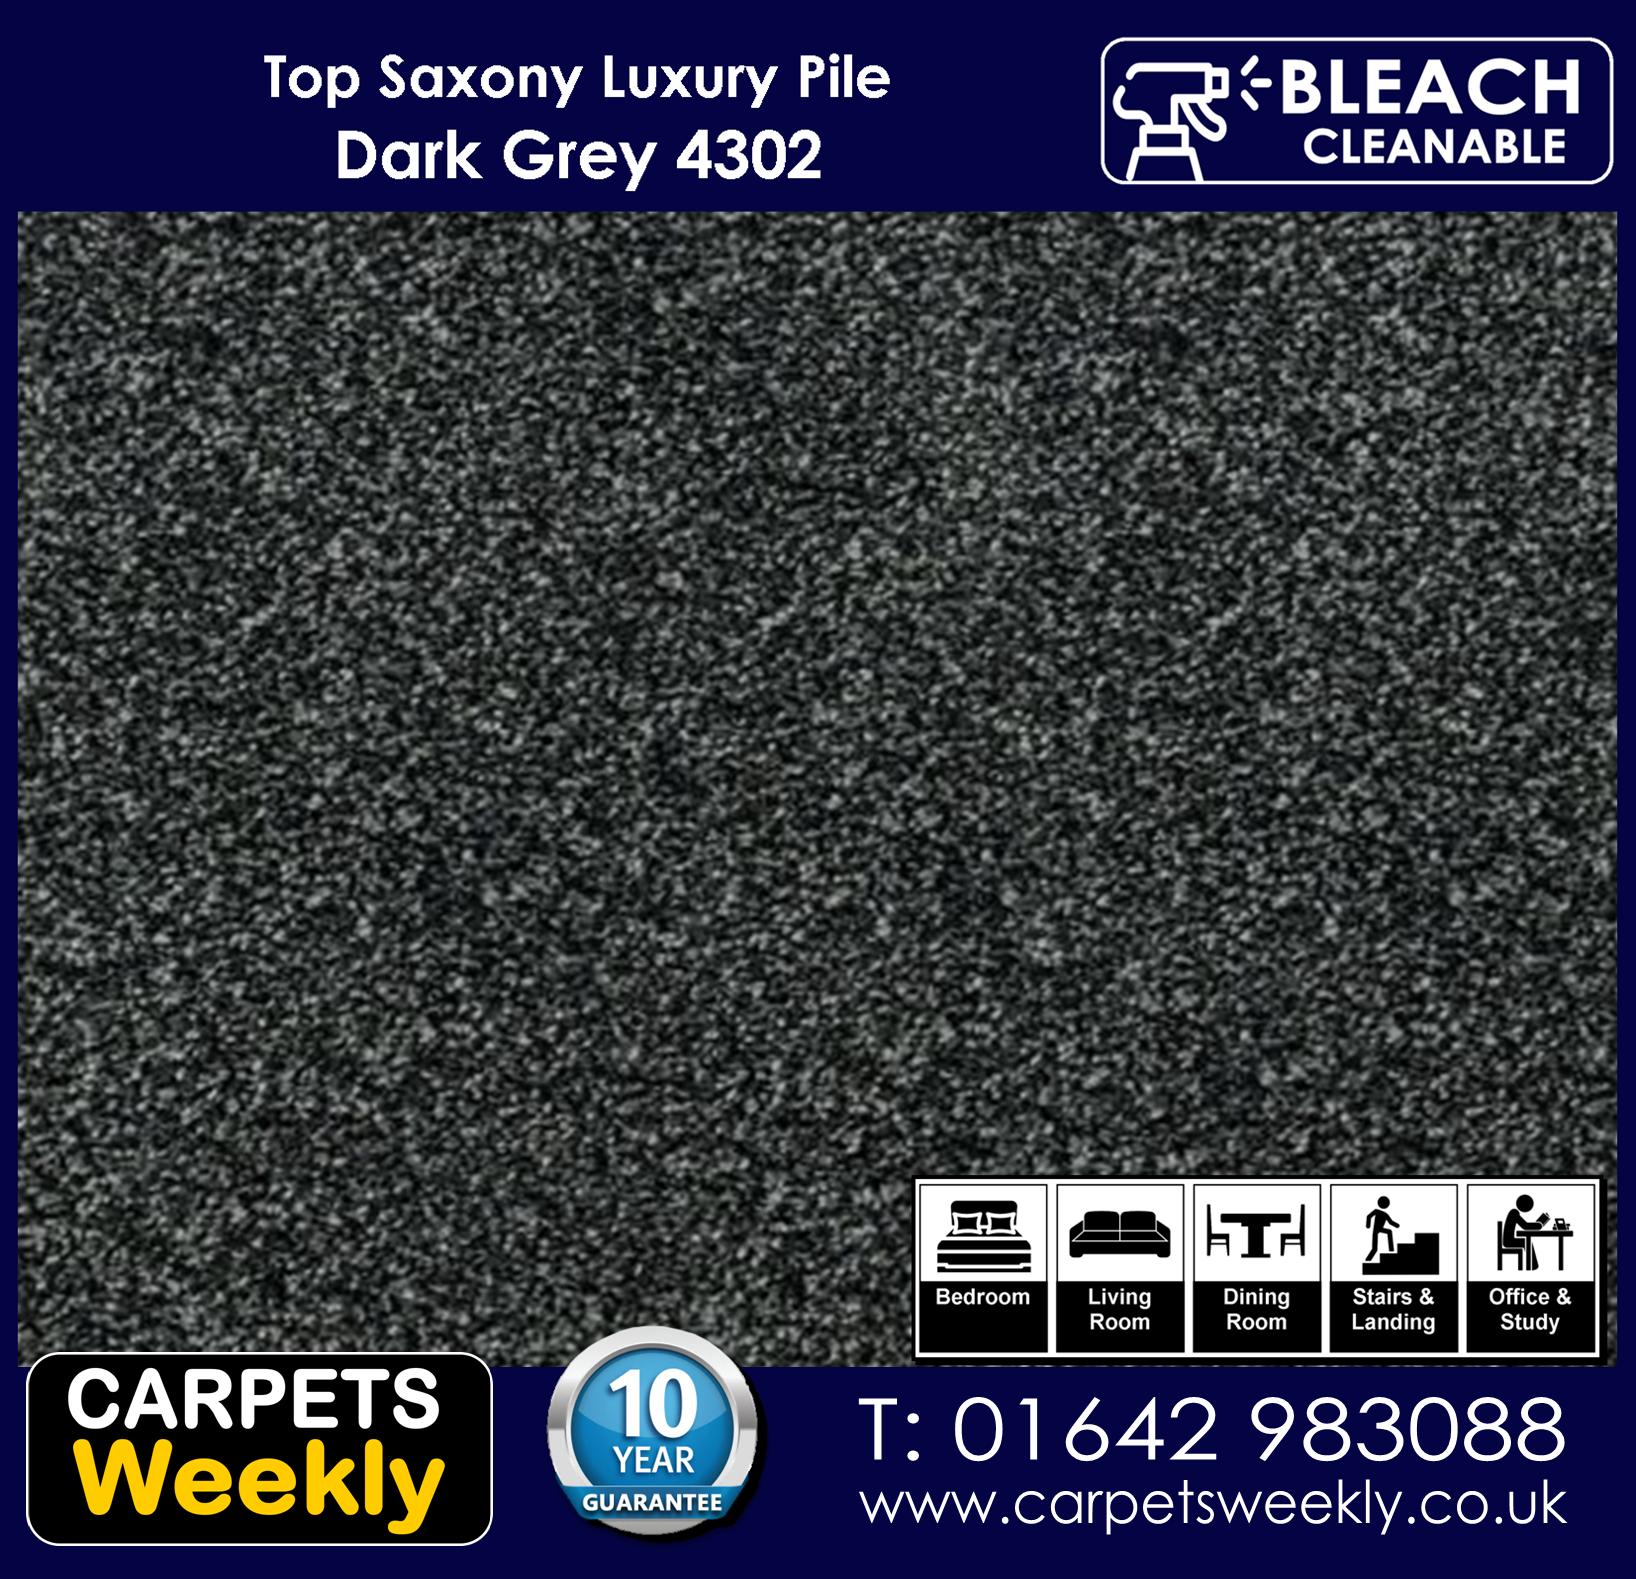 Top Saxony Dark Grey 4302 Carpet. Carpets Weekly